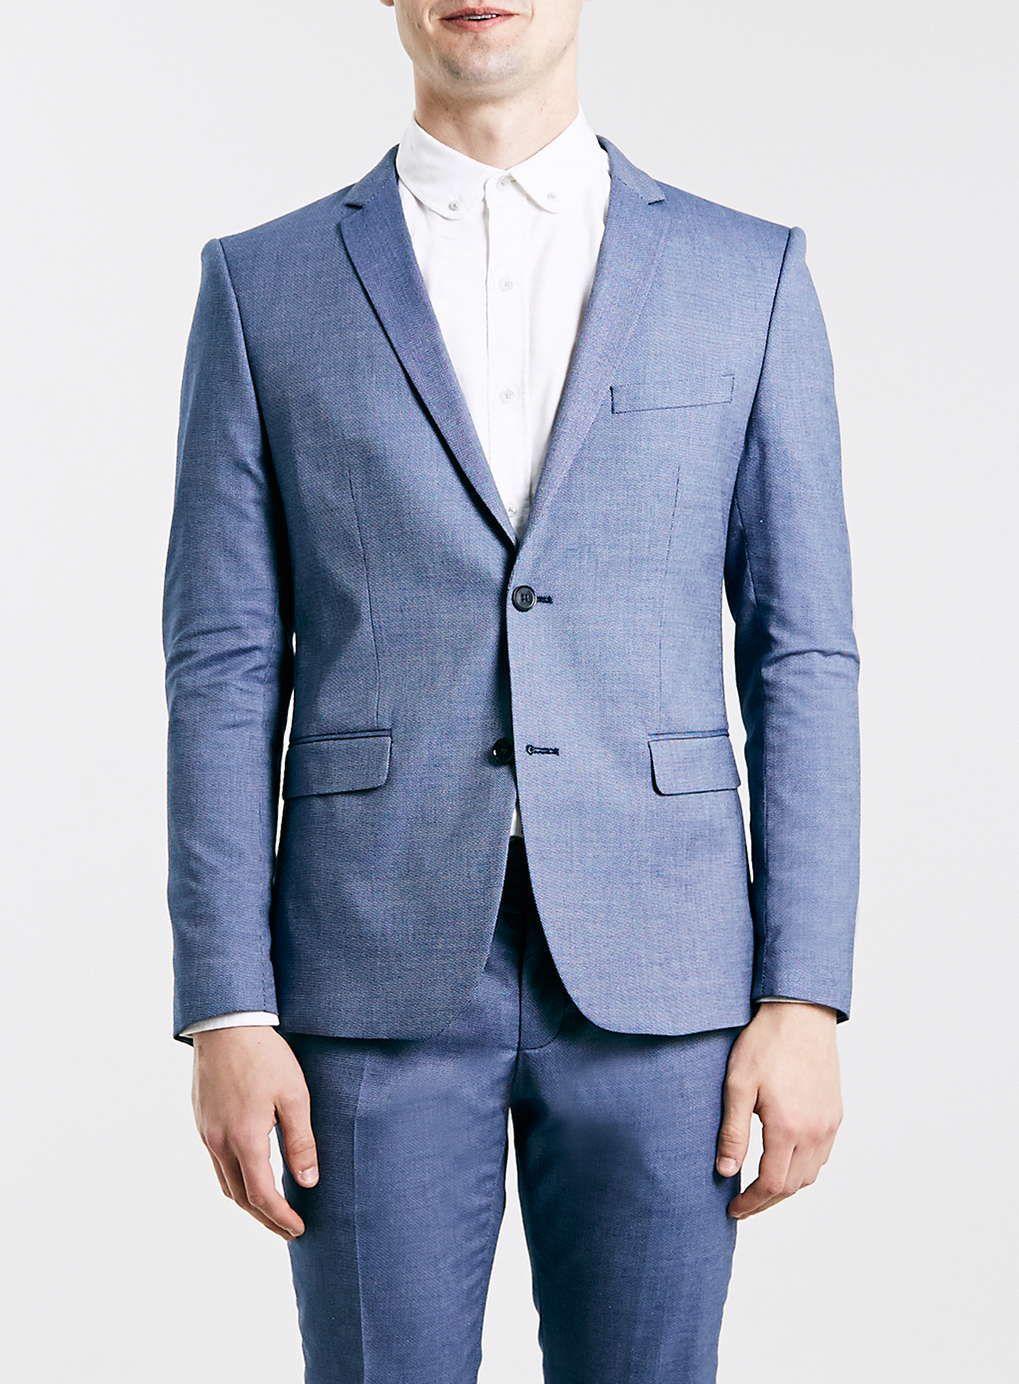 Selected Homme Slim Fit Navy Suit | TOPMAN Favorites | Pinterest ...